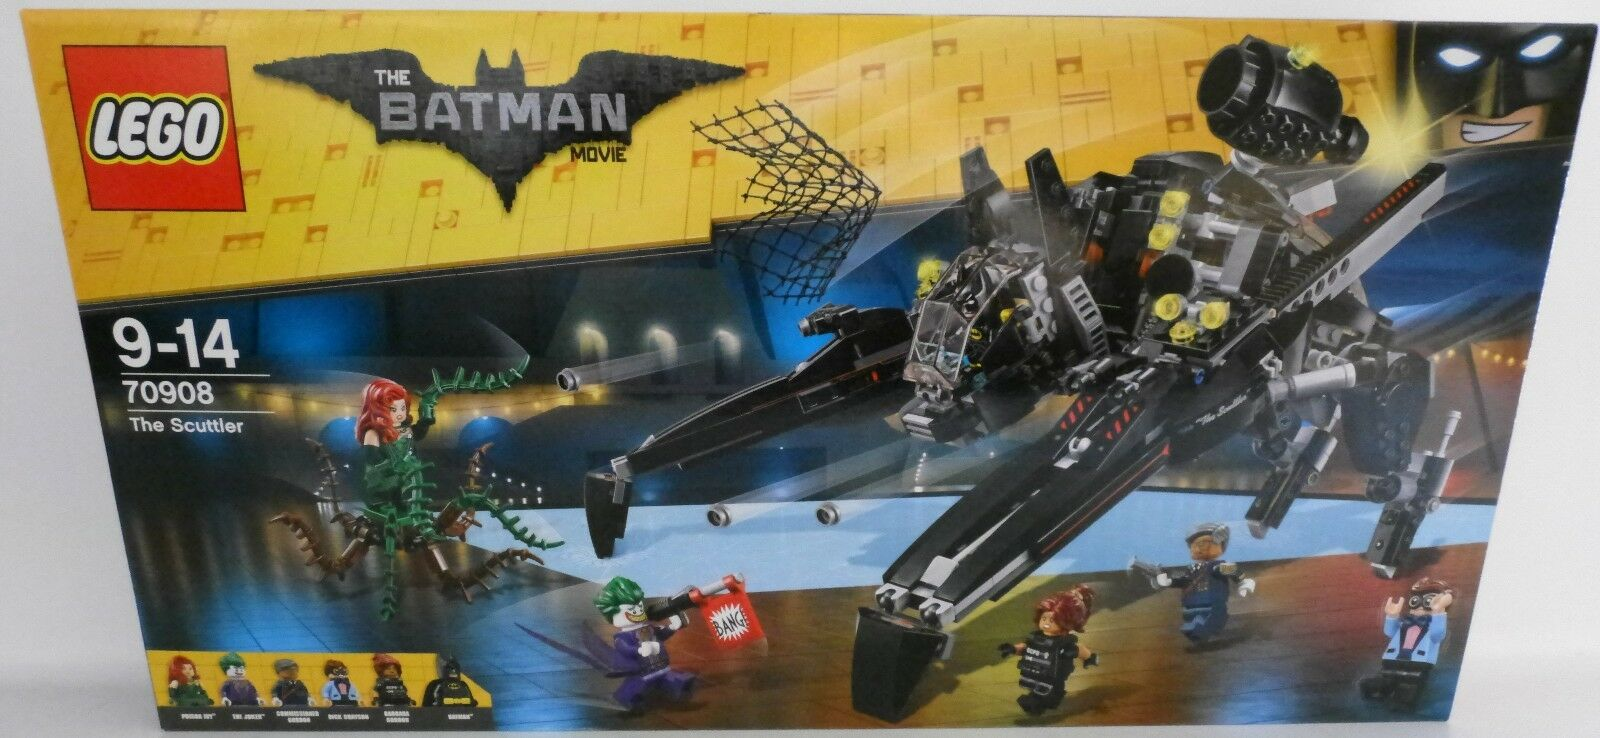 NEU LEGO® 70908 THE BATMAN MOVIE The Scuttler OVP